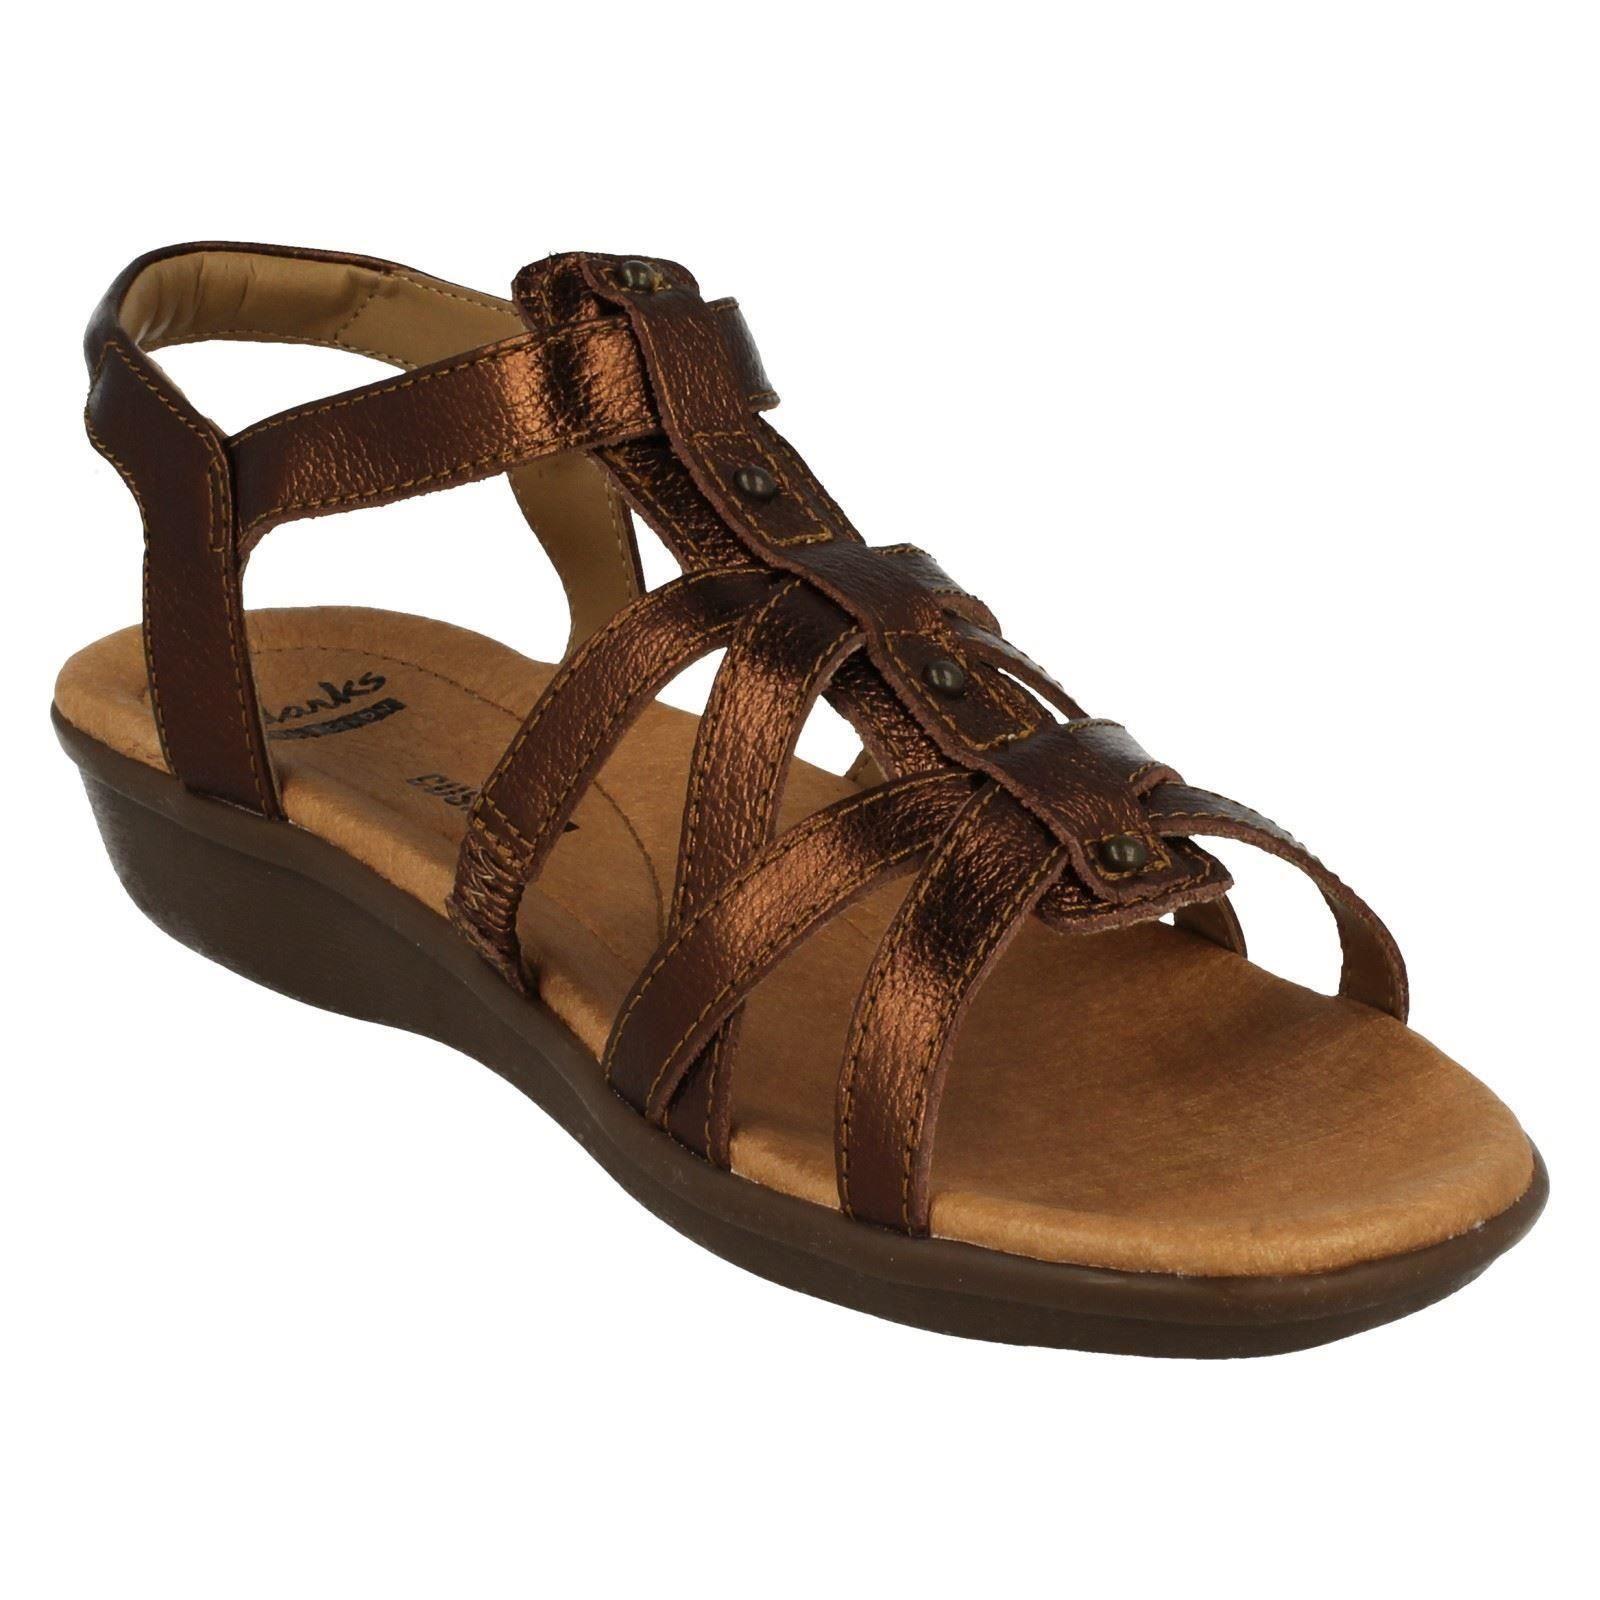 3c6e47035cc4 Ladies Clarks Open Toe Casual Sandals Style - Manilla Bonita